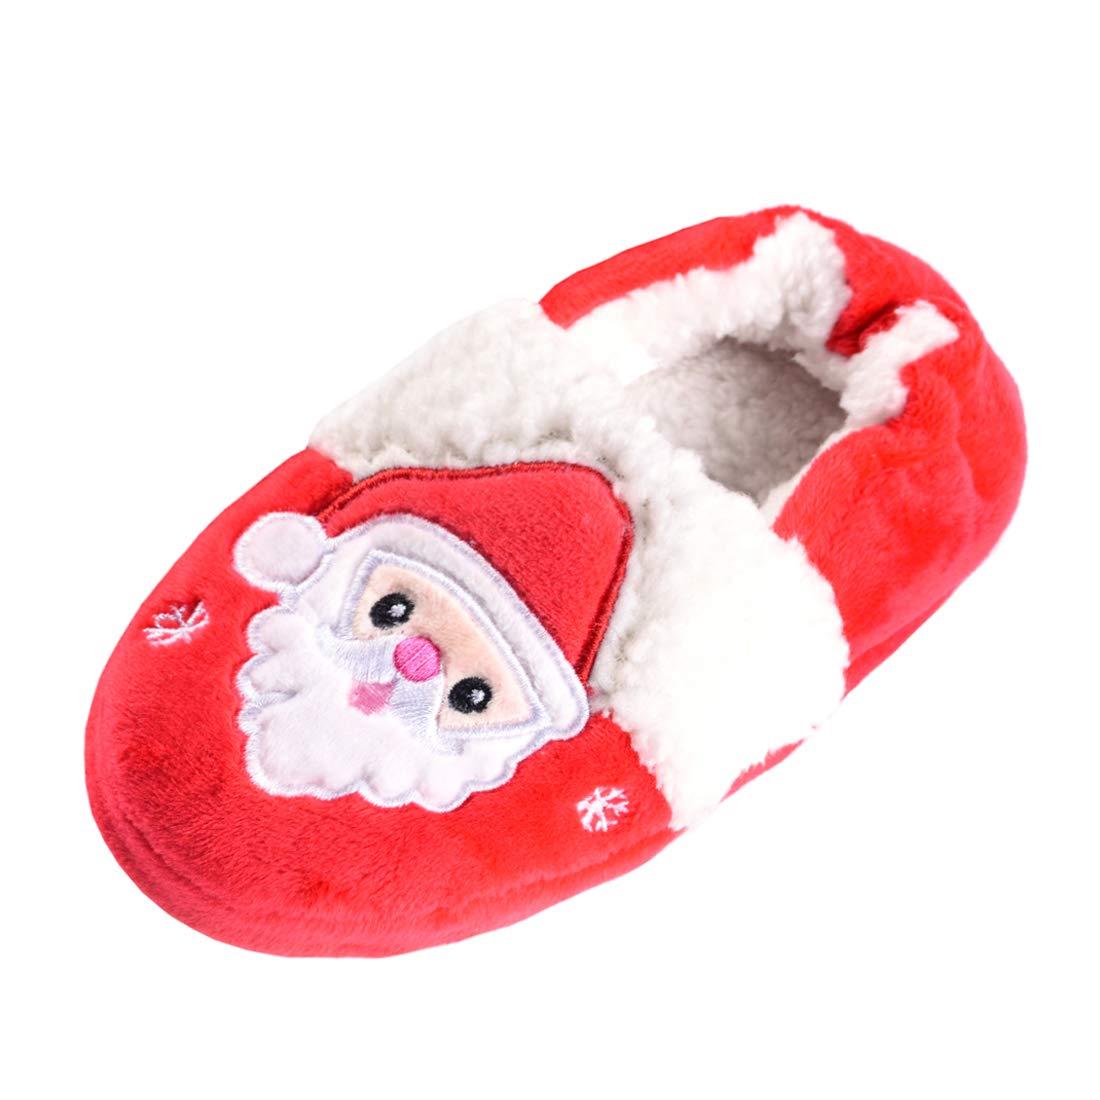 Beeliss Toddler Girls Slippers Cartoon Plush Warm Shoes